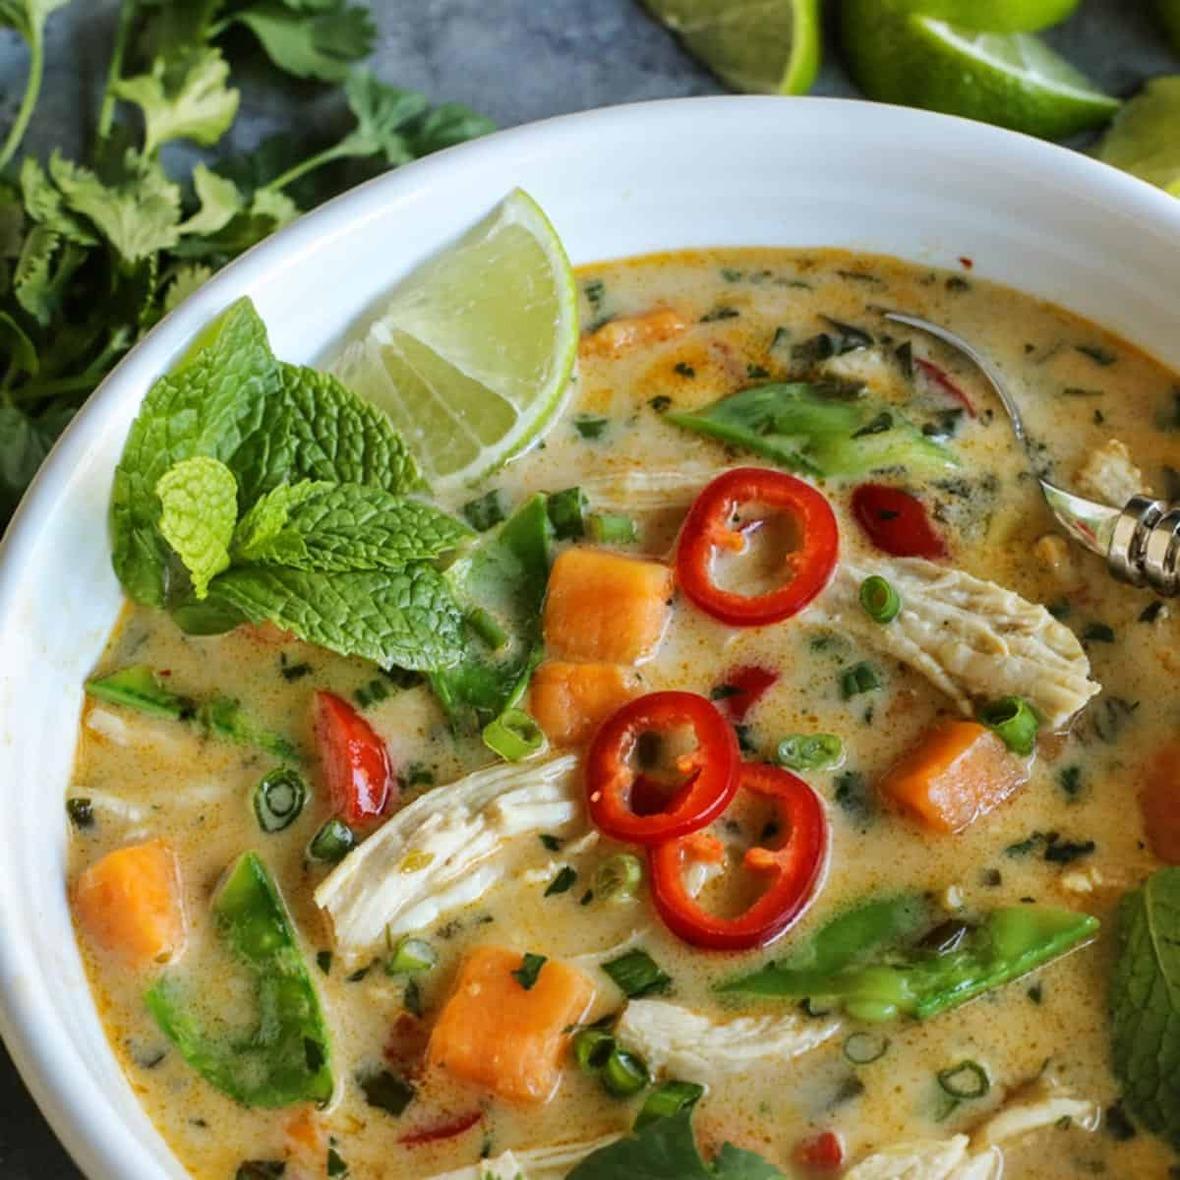 thai-chicken-soup AFarmgirlsDabbles AFD-4-2-sq